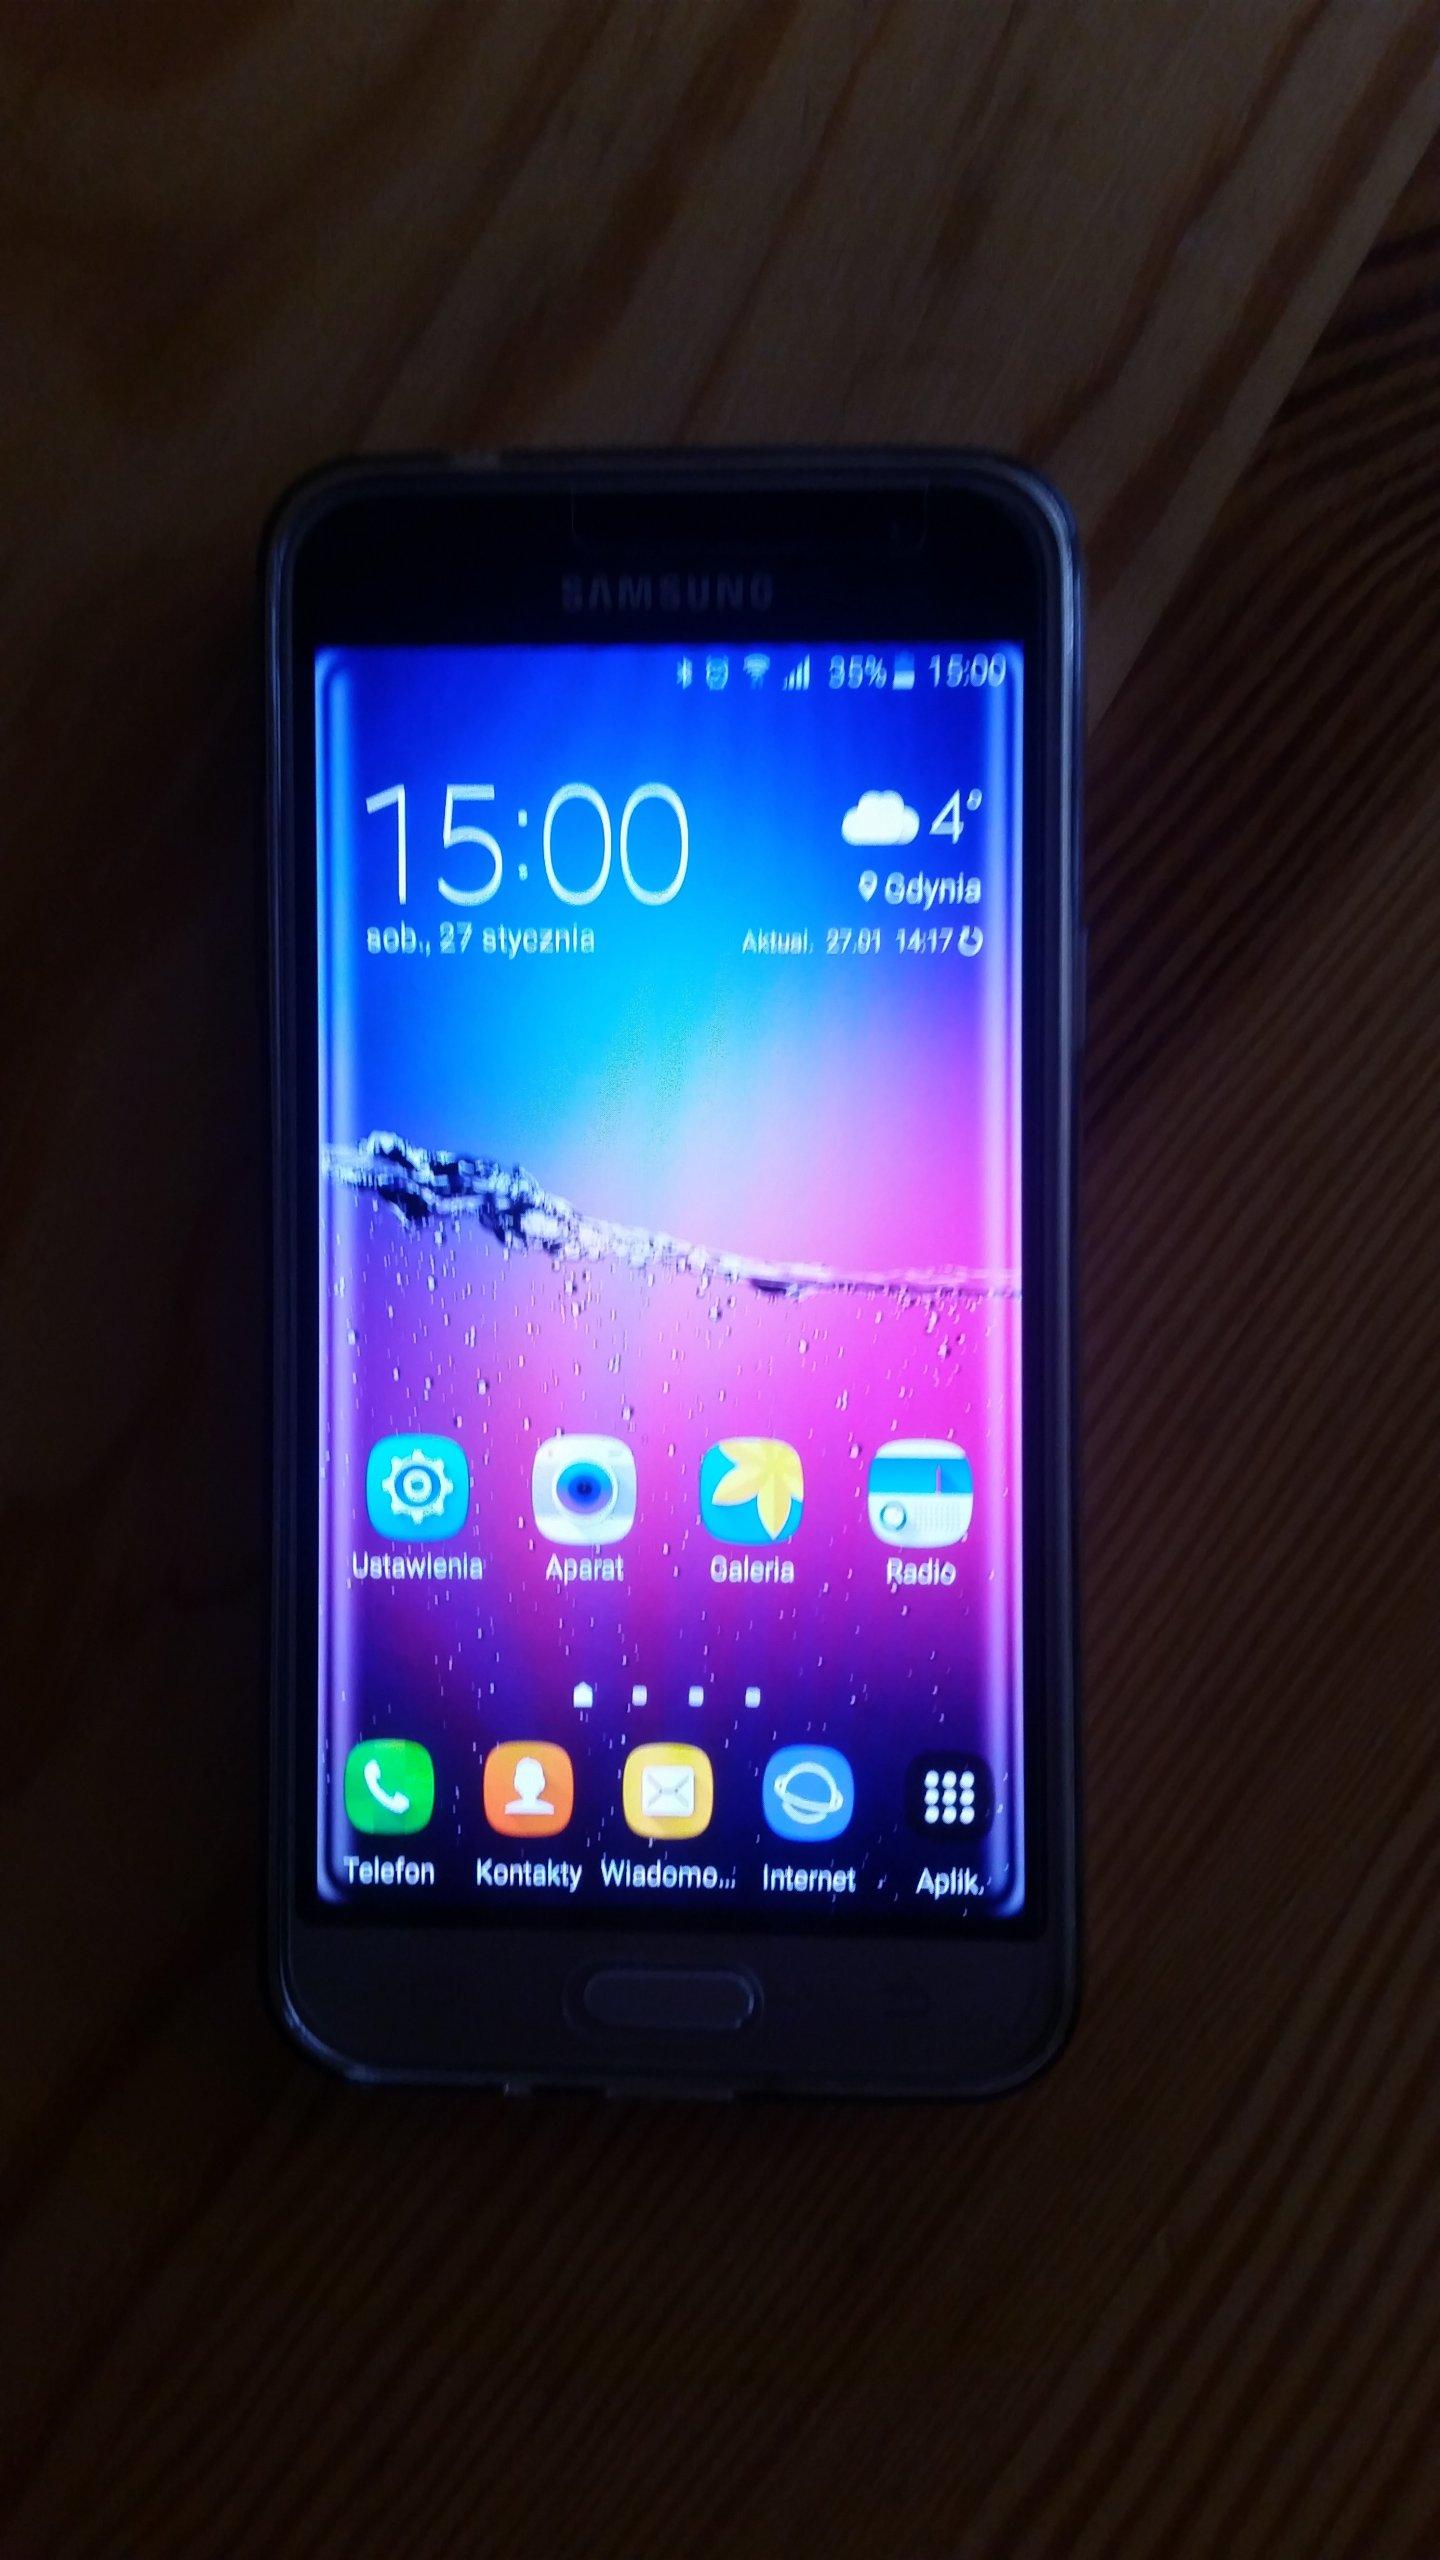 Samsung Galaxy J3 Gold 2016 32 Gb Karta Pamieci 7187111781